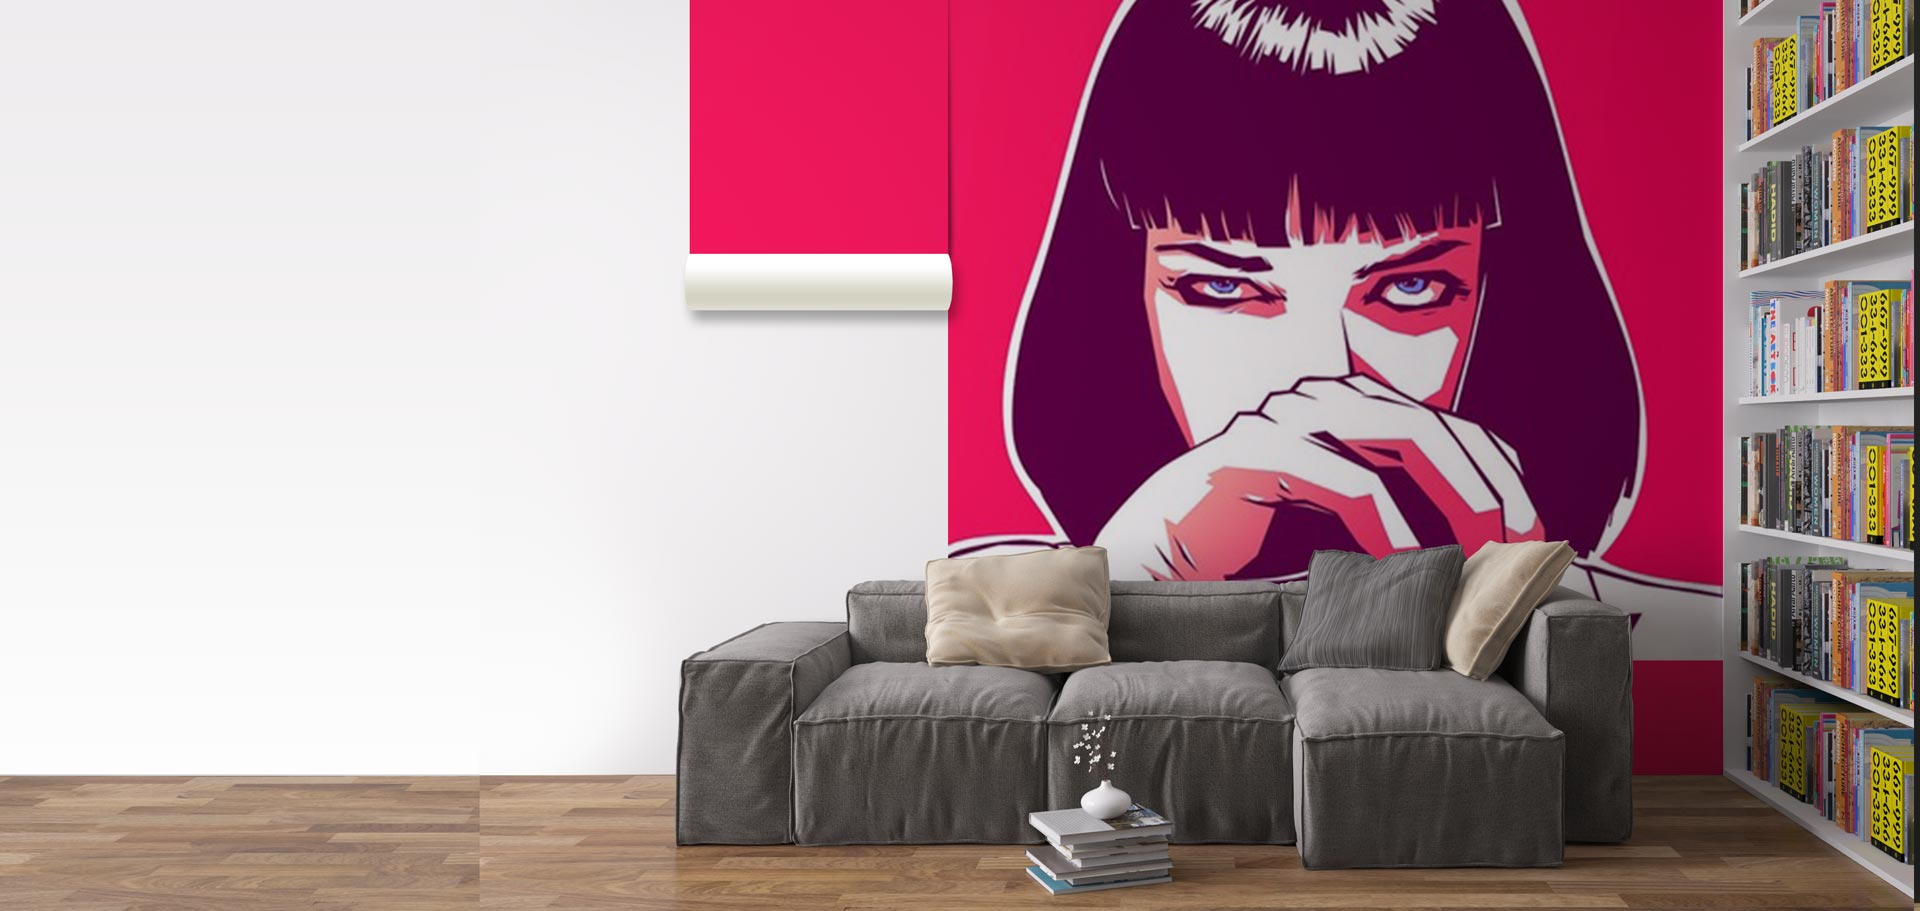 poster adhesif sur mesure maison design. Black Bedroom Furniture Sets. Home Design Ideas